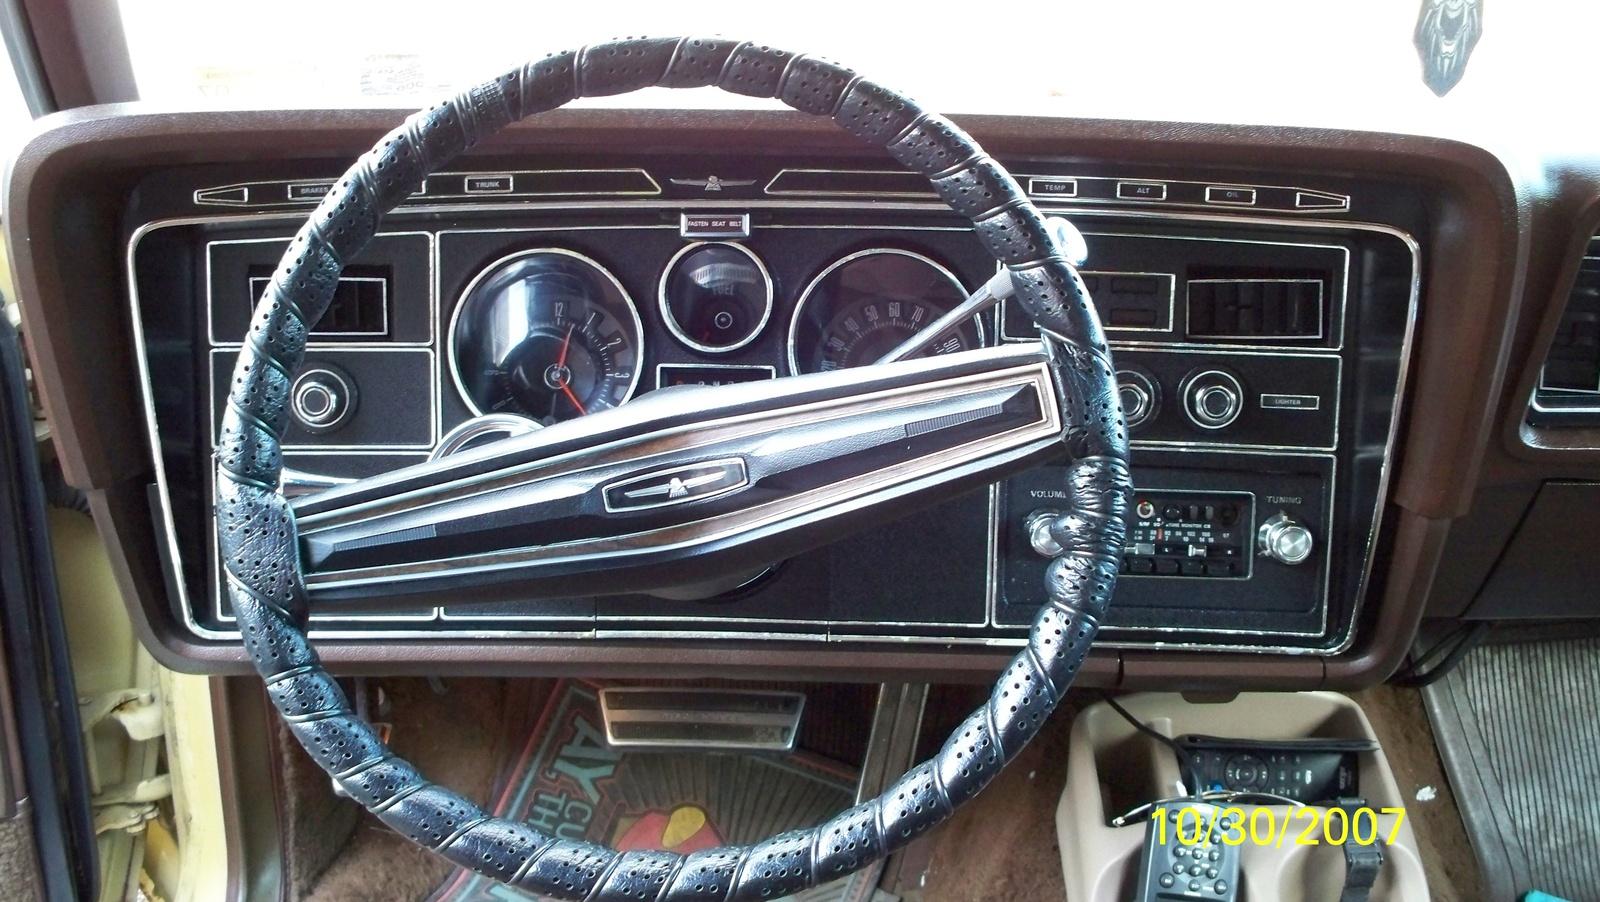 1972 Ford Thunderbird Interior Trim - Automotive Mileposts